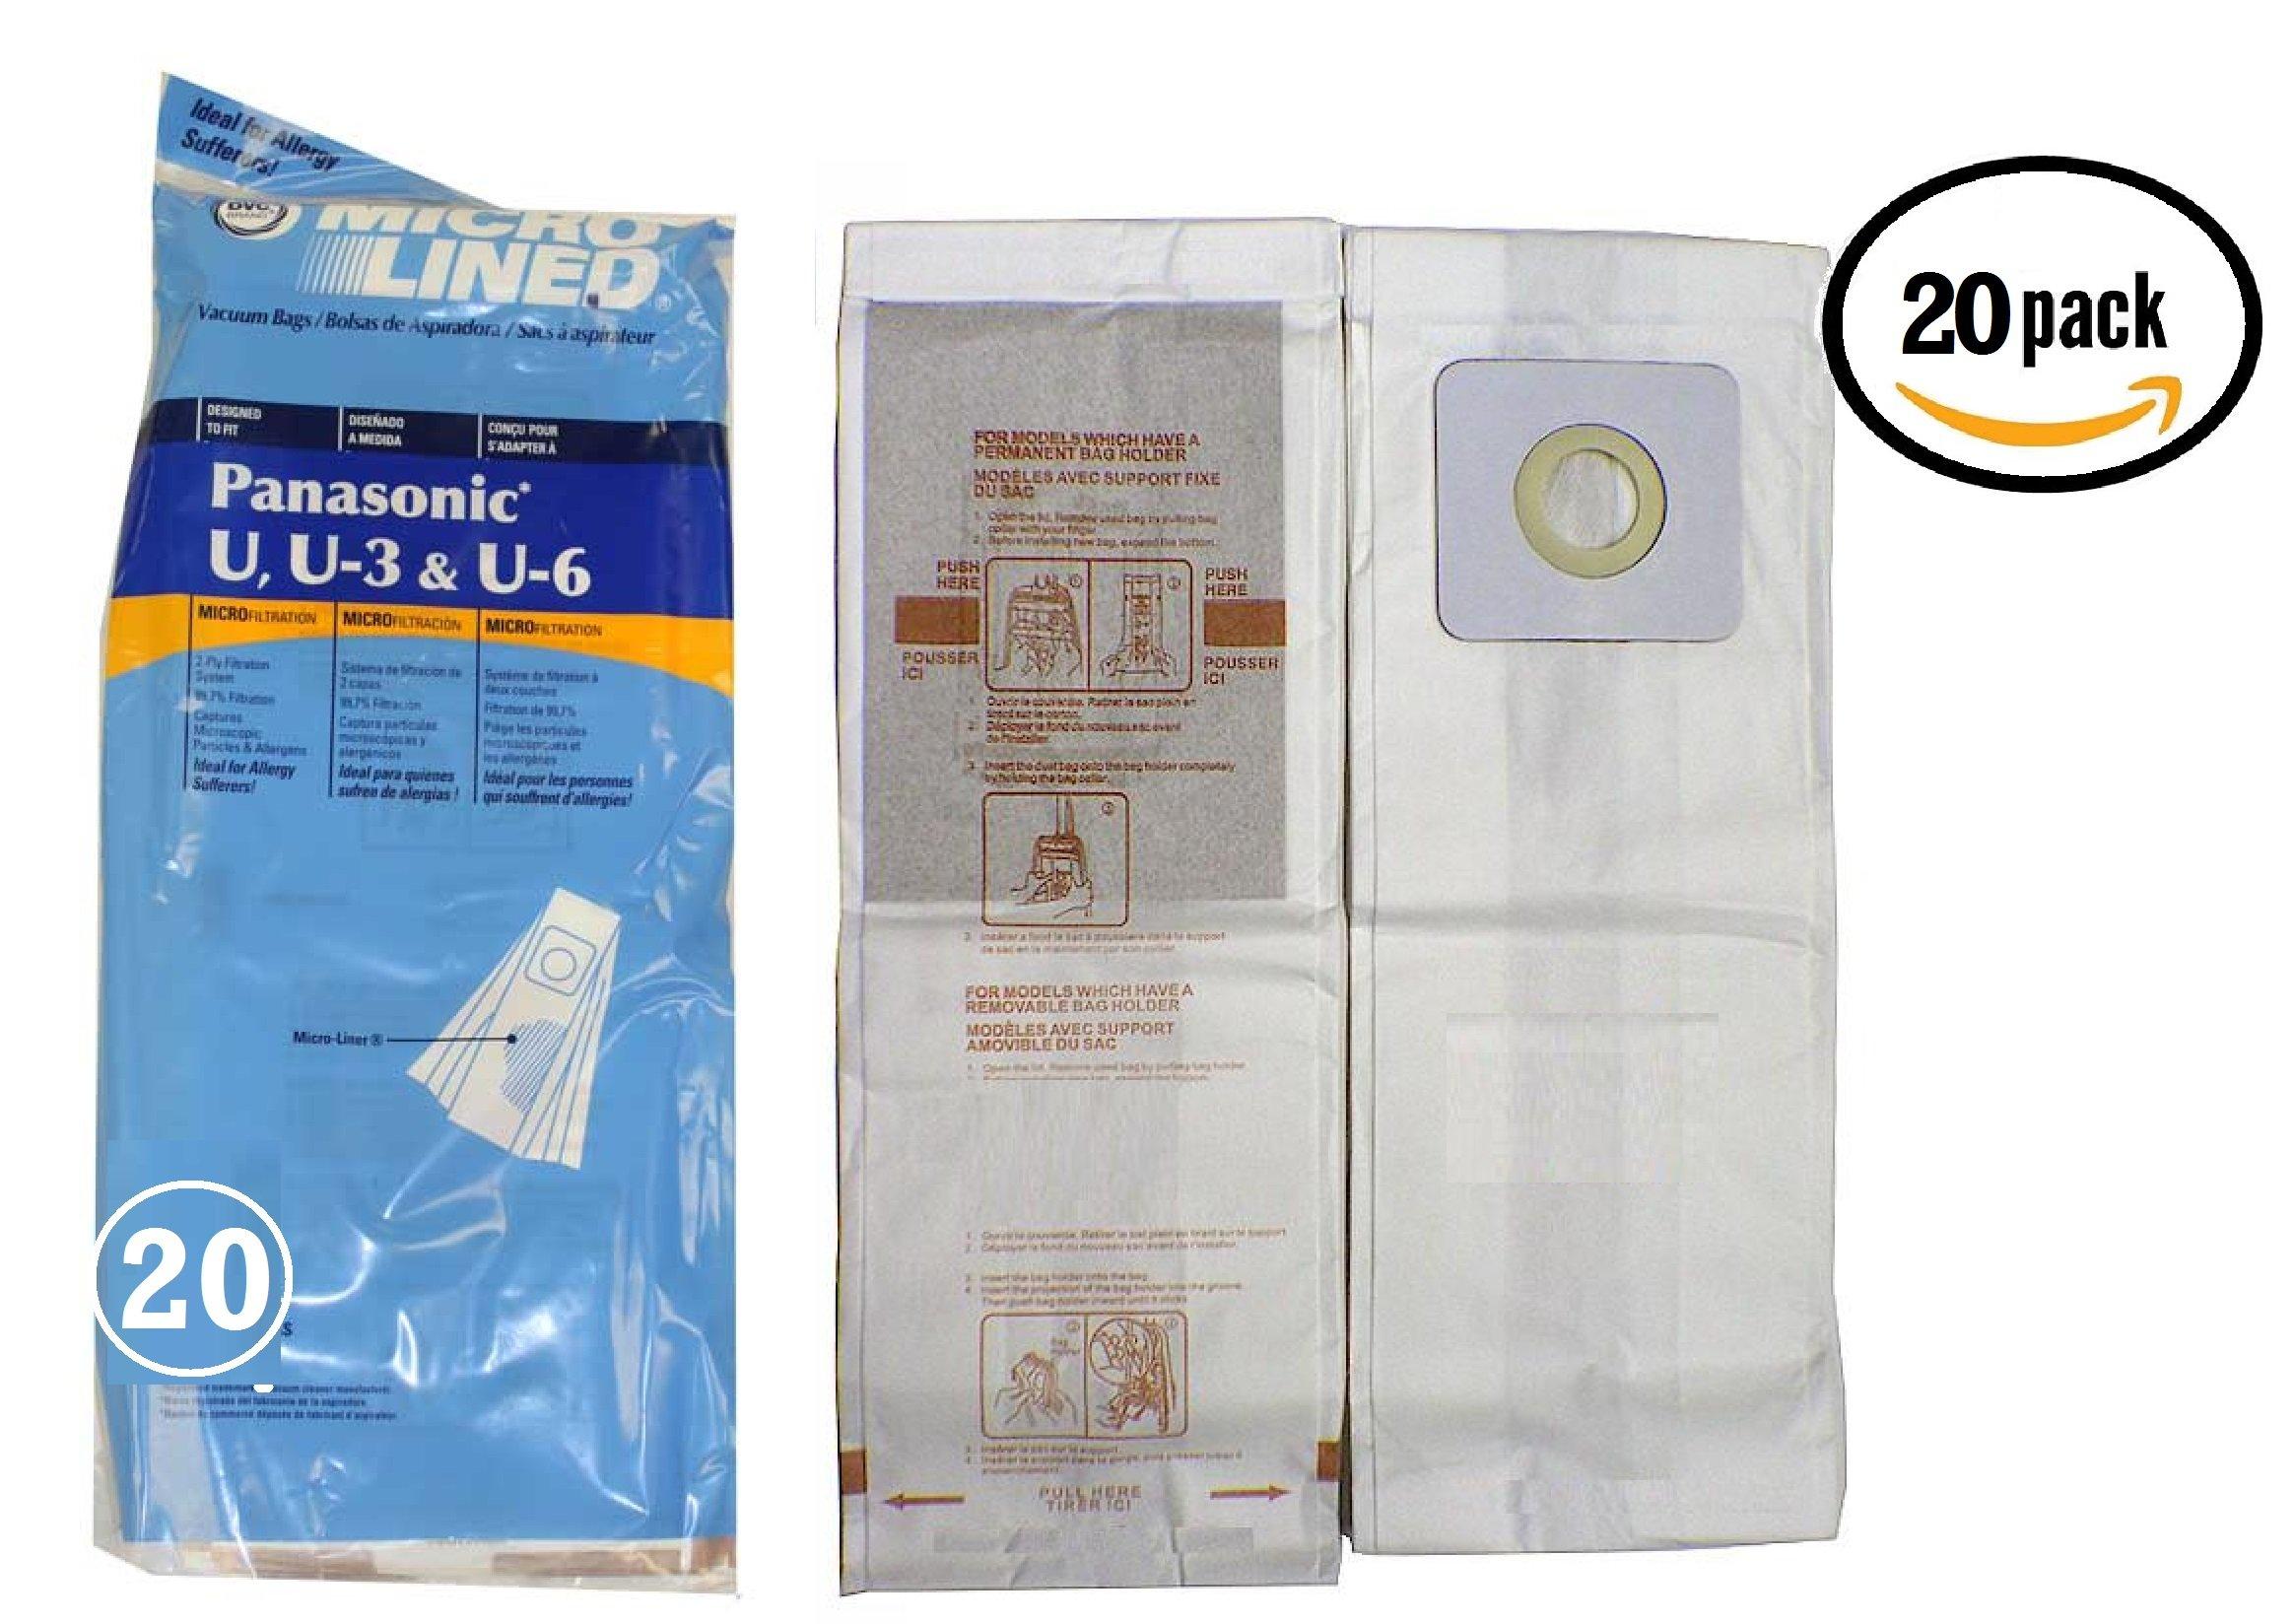 20 Panasonic Type U, U3, U6 DVC Micro-Lined Made Vacuum Bags, 20 Pack.